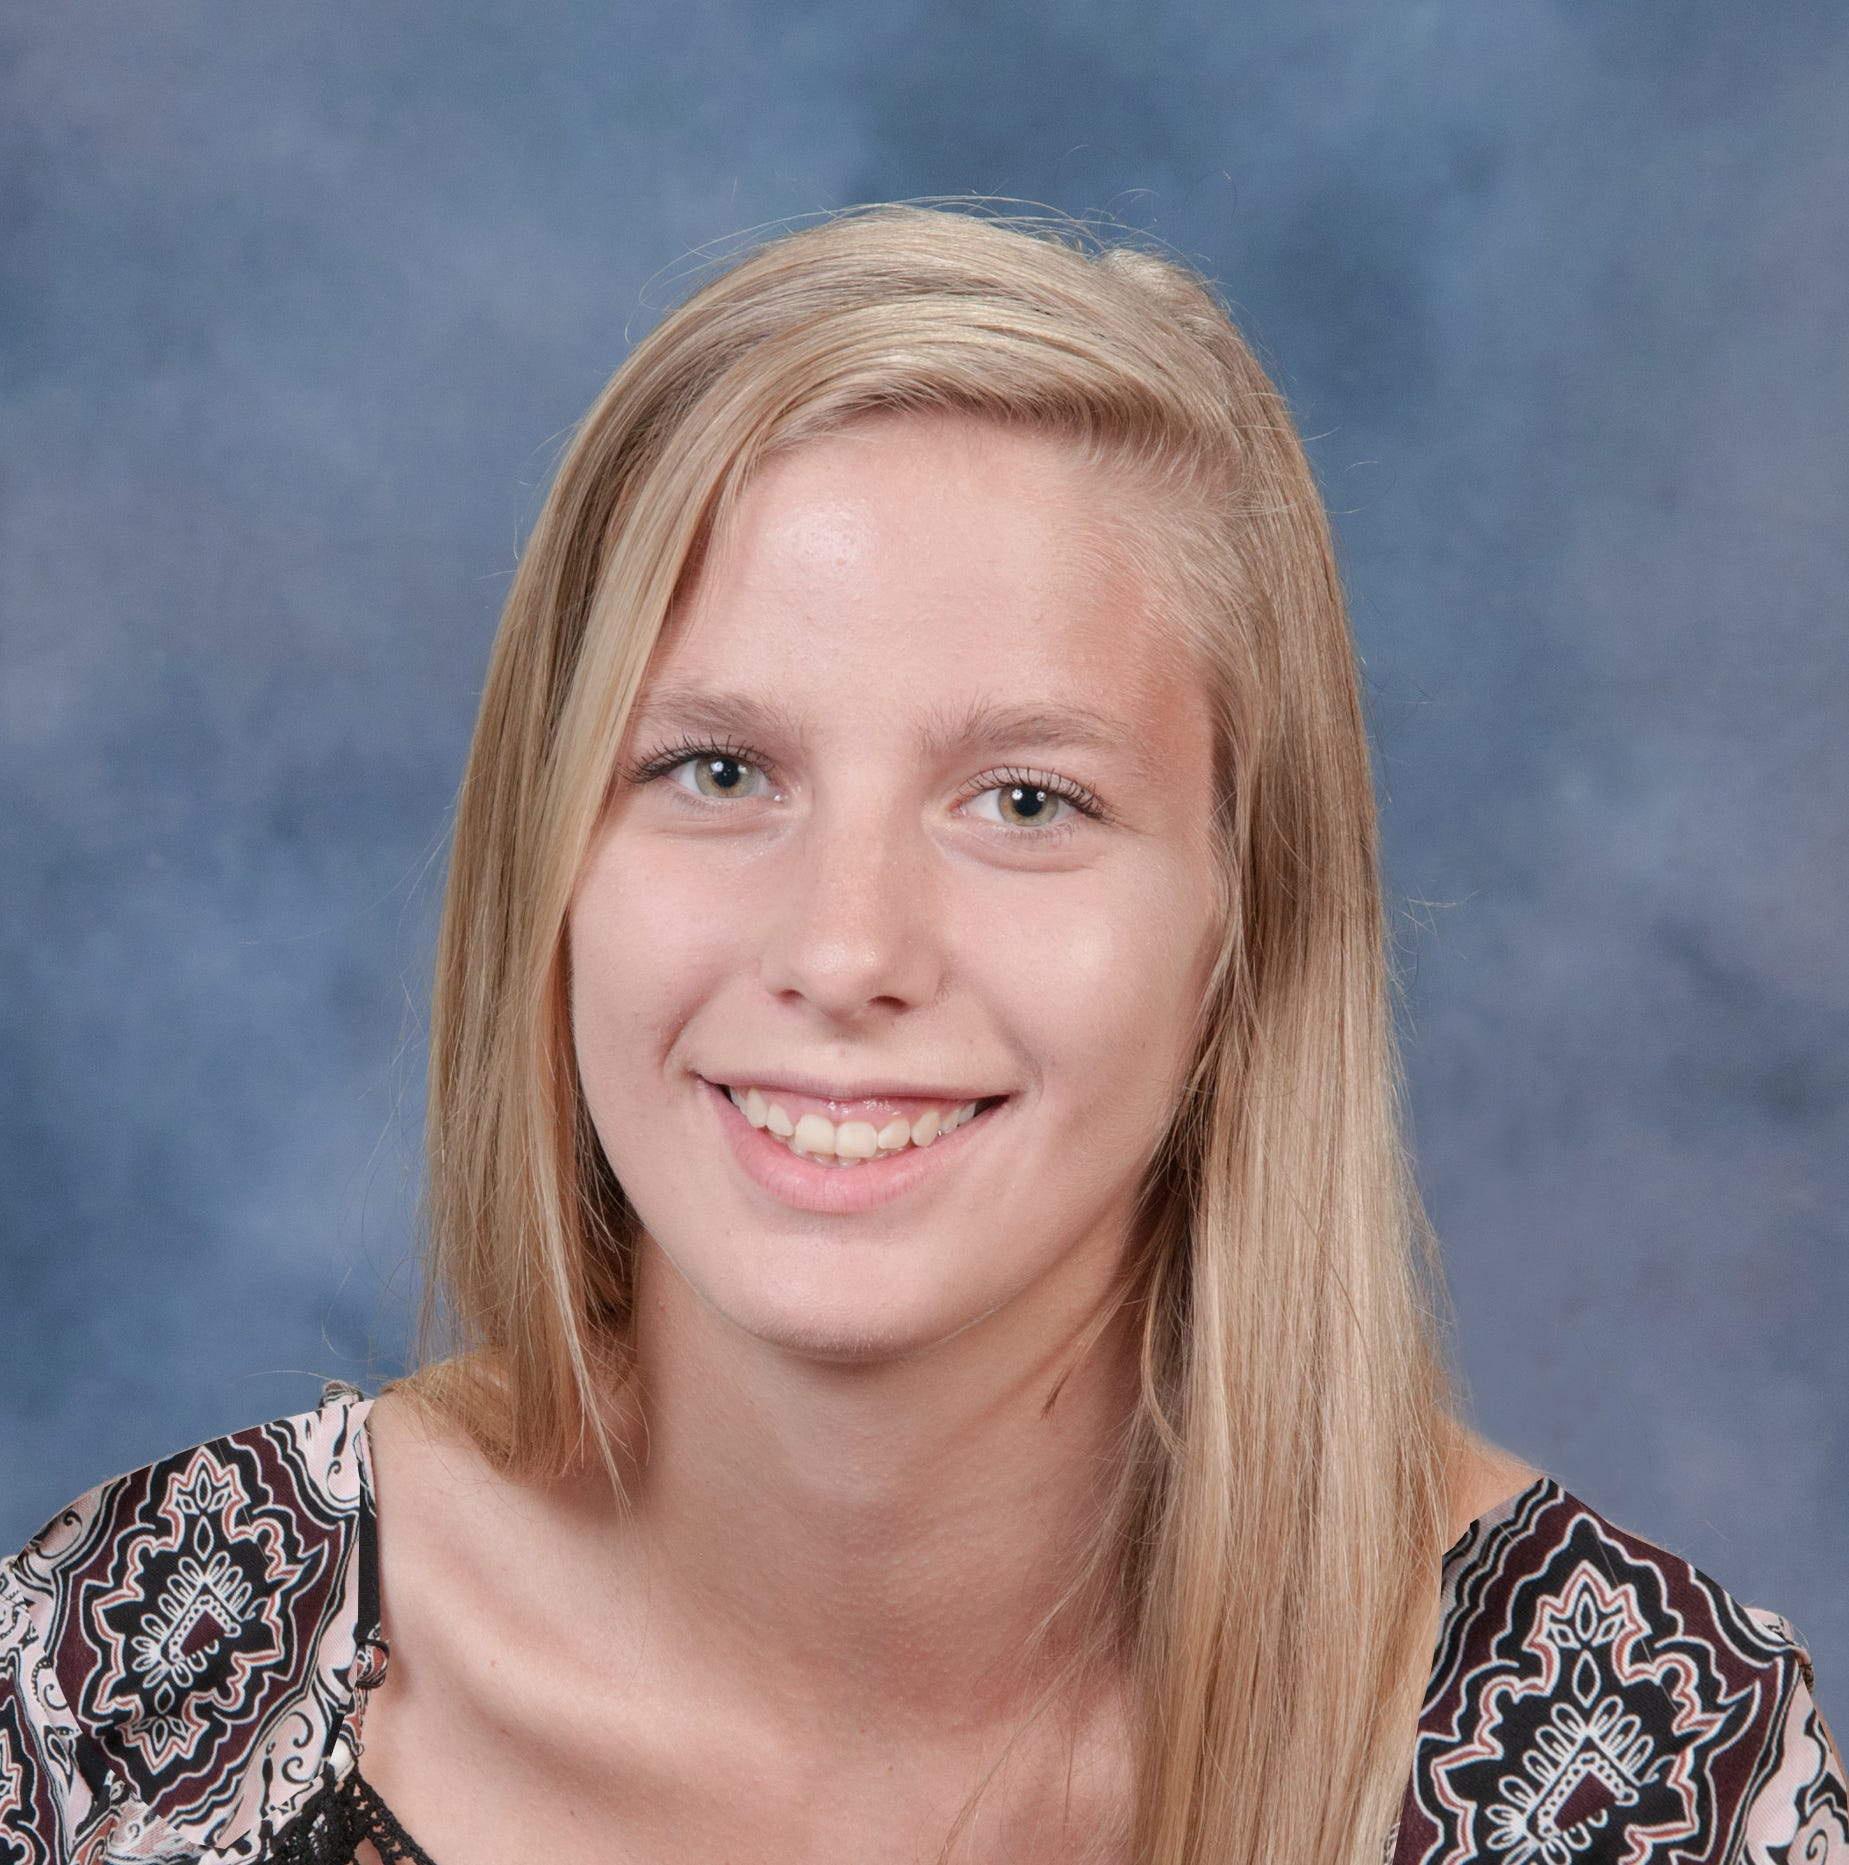 Breana Rouhselang, 17, of Mishawaka, Indiana, was found dead Dec. 9, 2018.